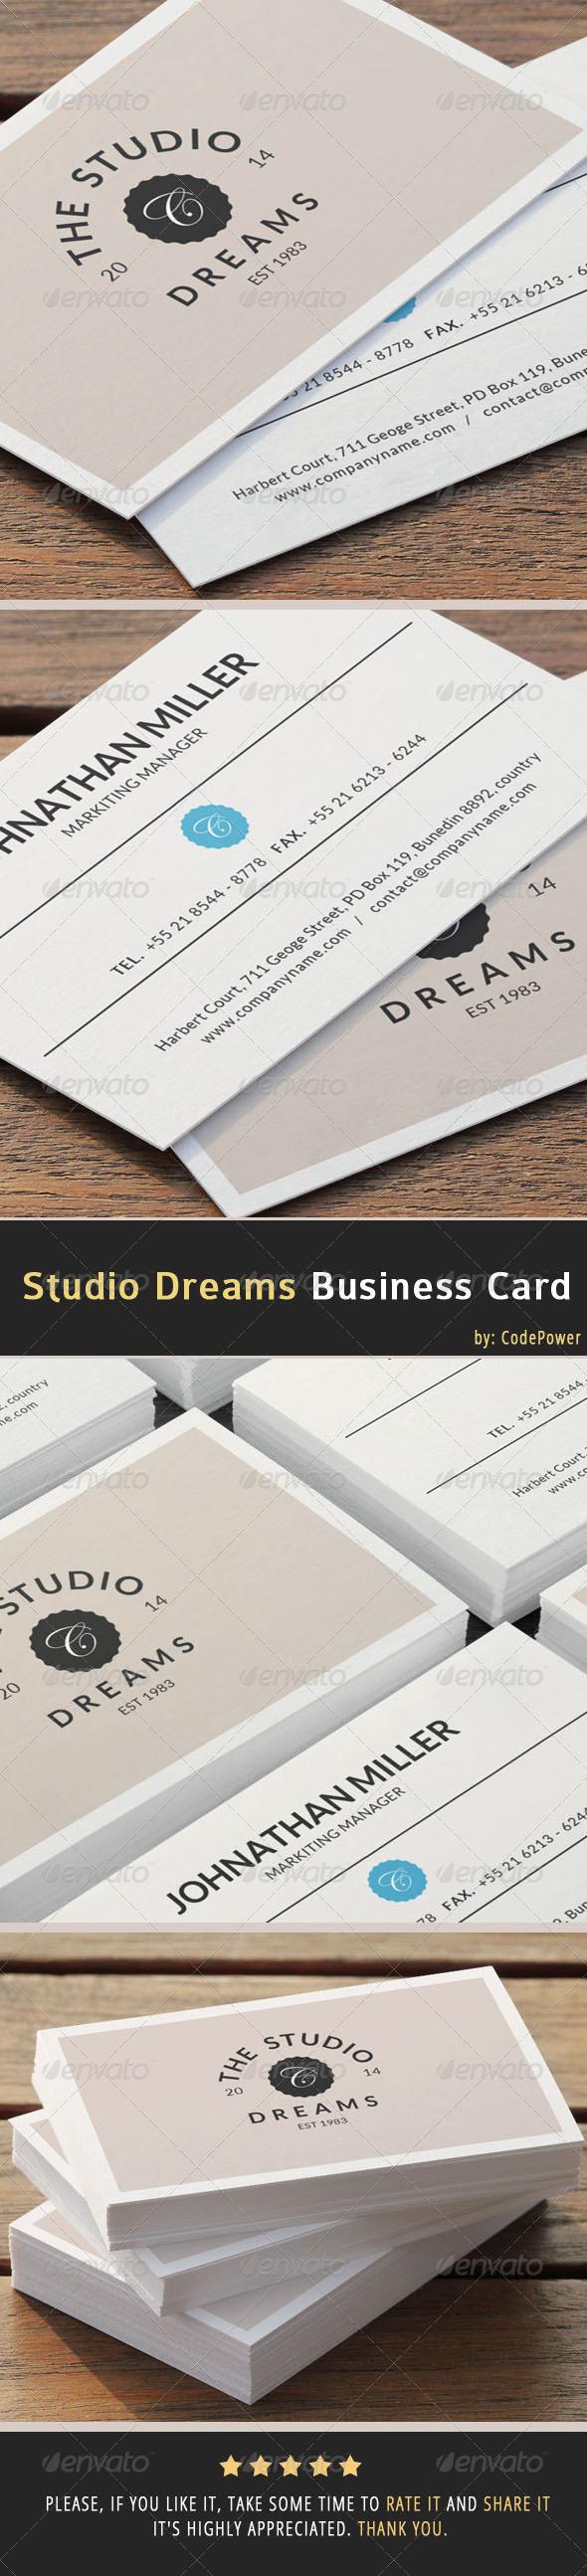 Studio Dreams Business Card - Creative Business Cards